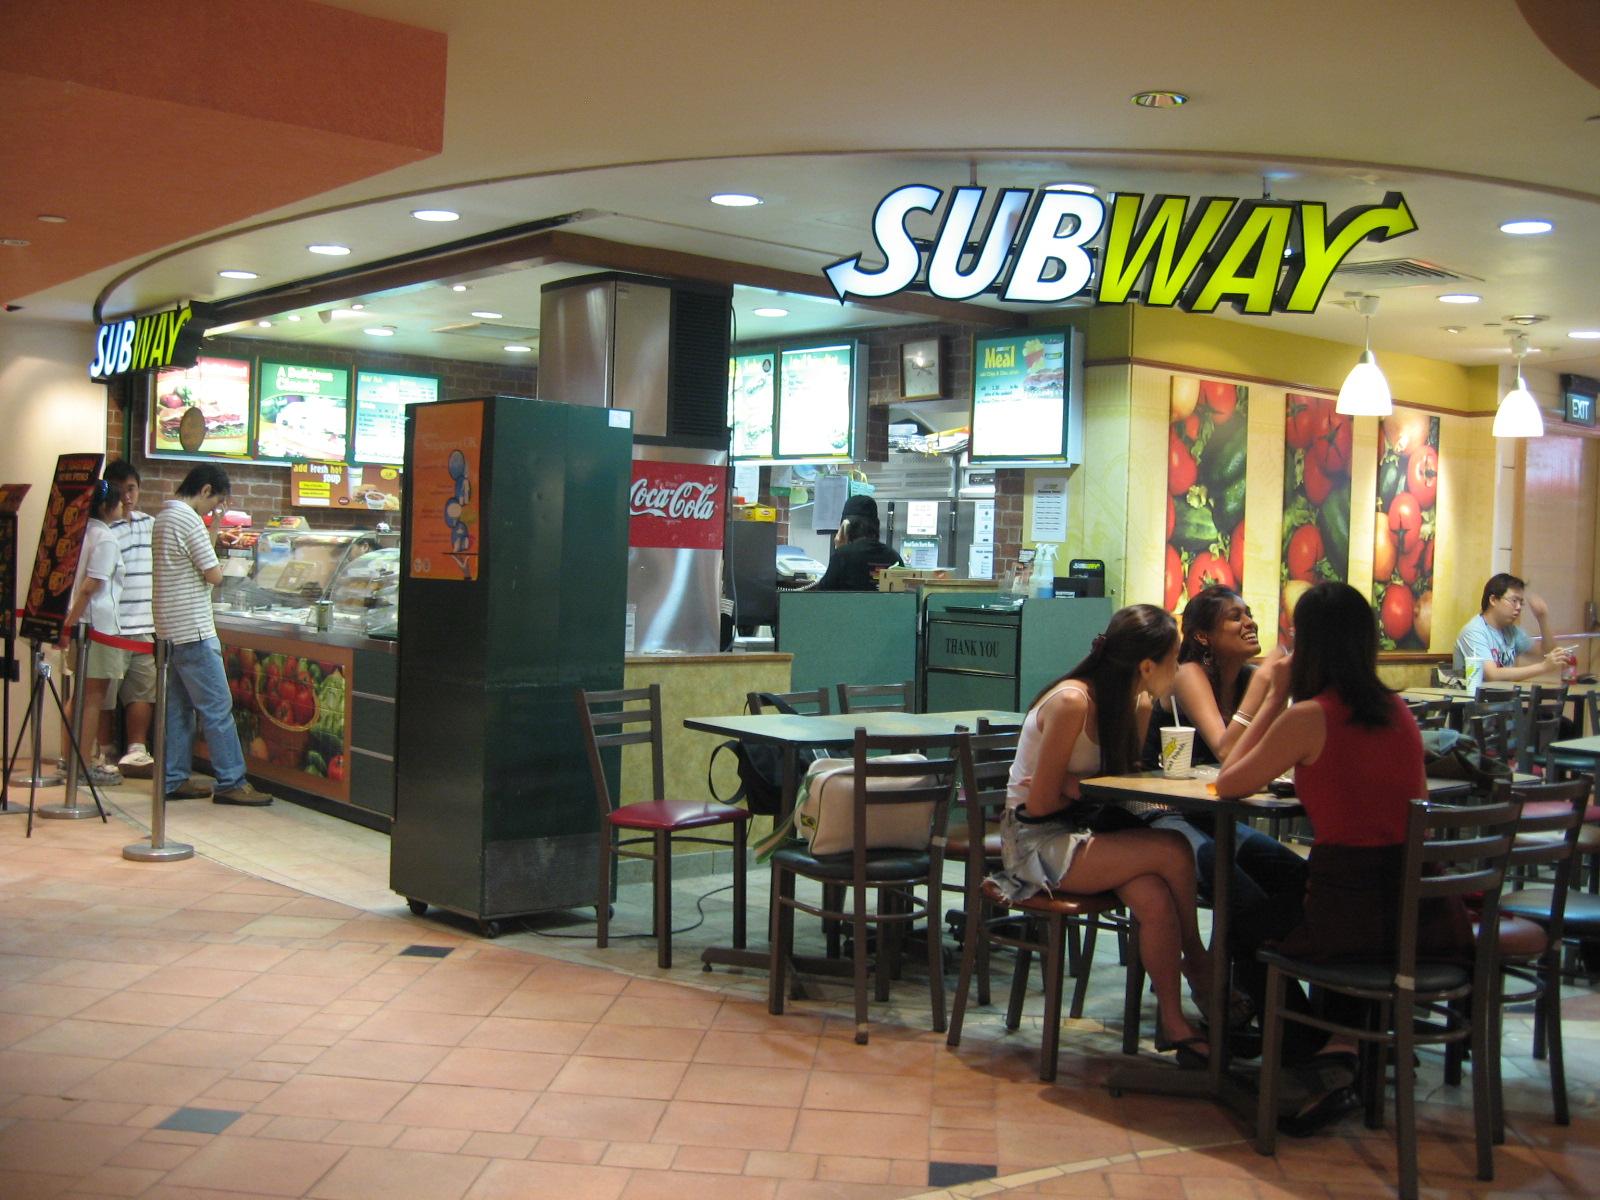 Buy Subway Stock